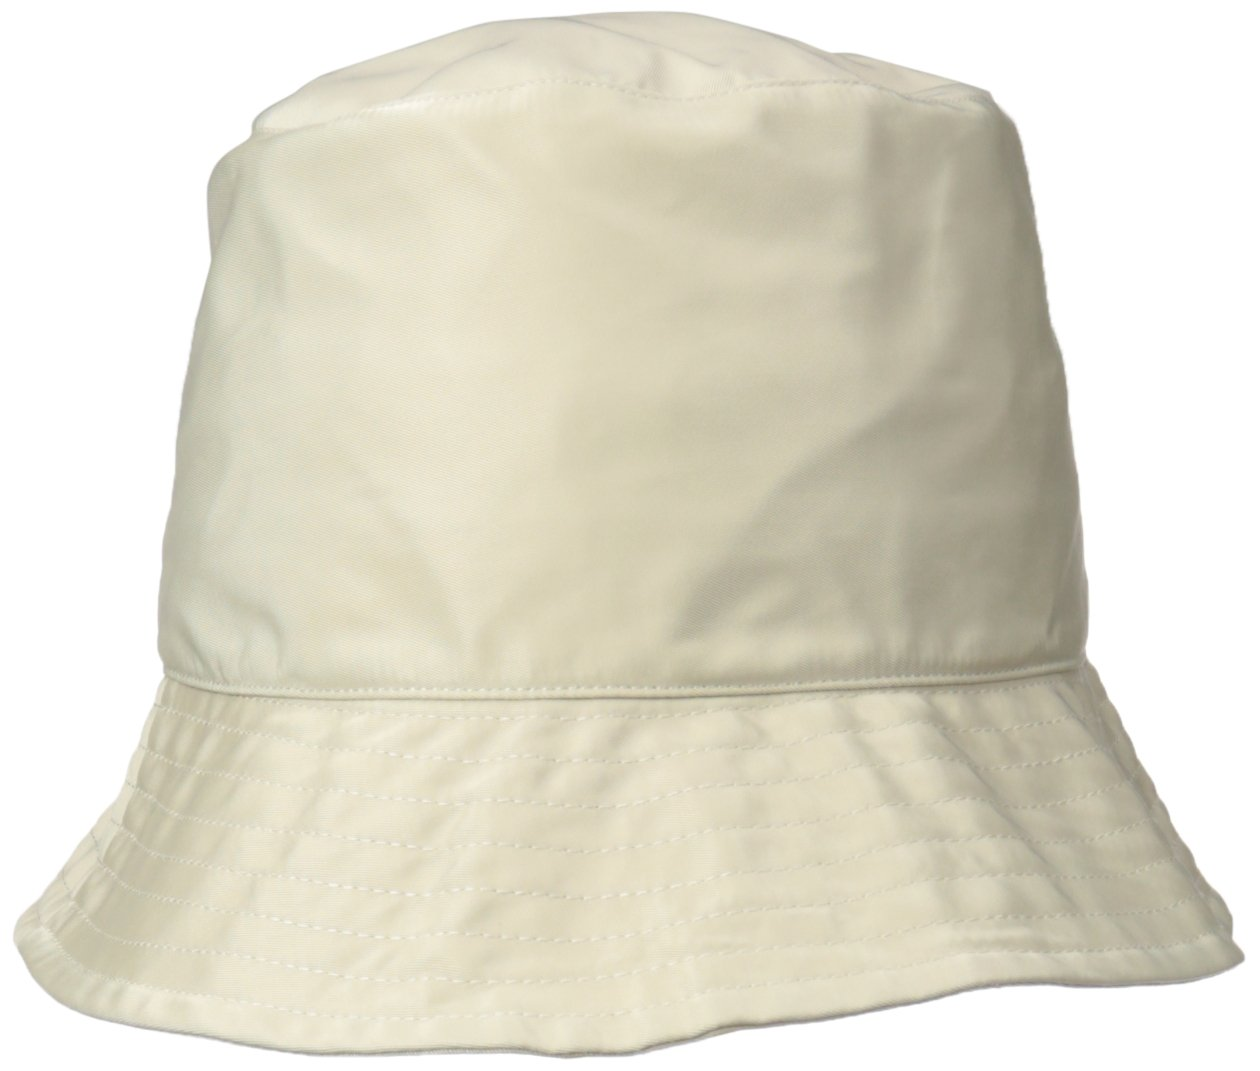 Nine West Women's Nylon Bucket Rain Hat, Tan, One Size by Nine West